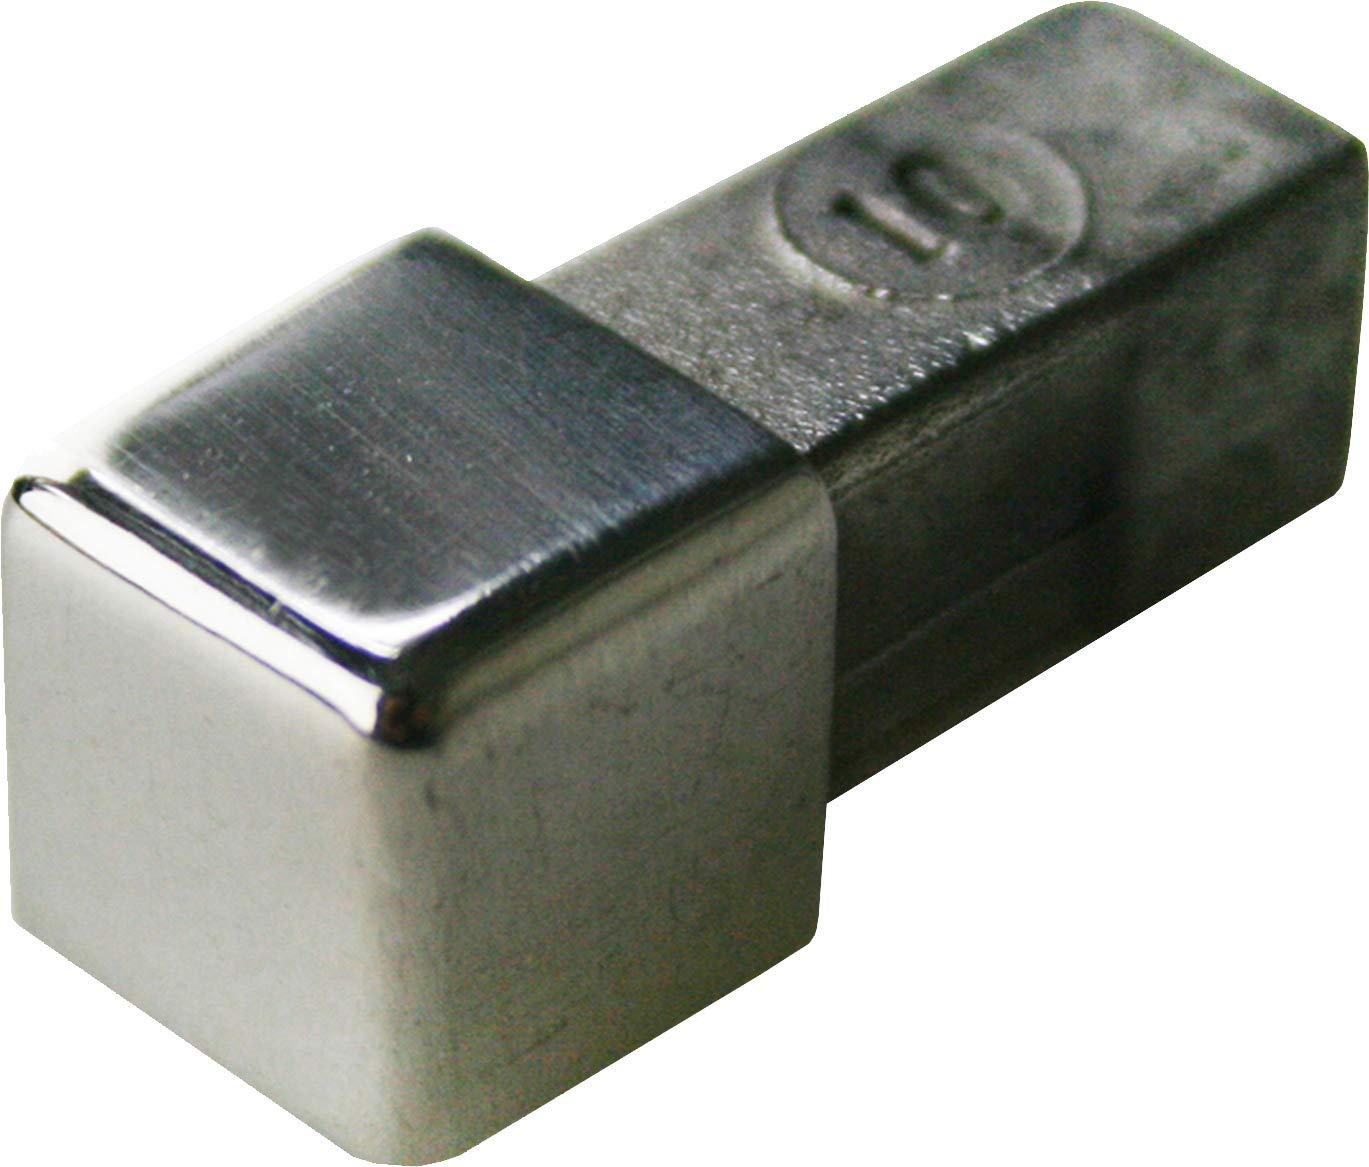 PREMIUM FUCHS Ecke kein Abbl/ättern m/öglich Vollmaterial H: 8mm Quadratprofil Edelstahl V2A Gl/änzend